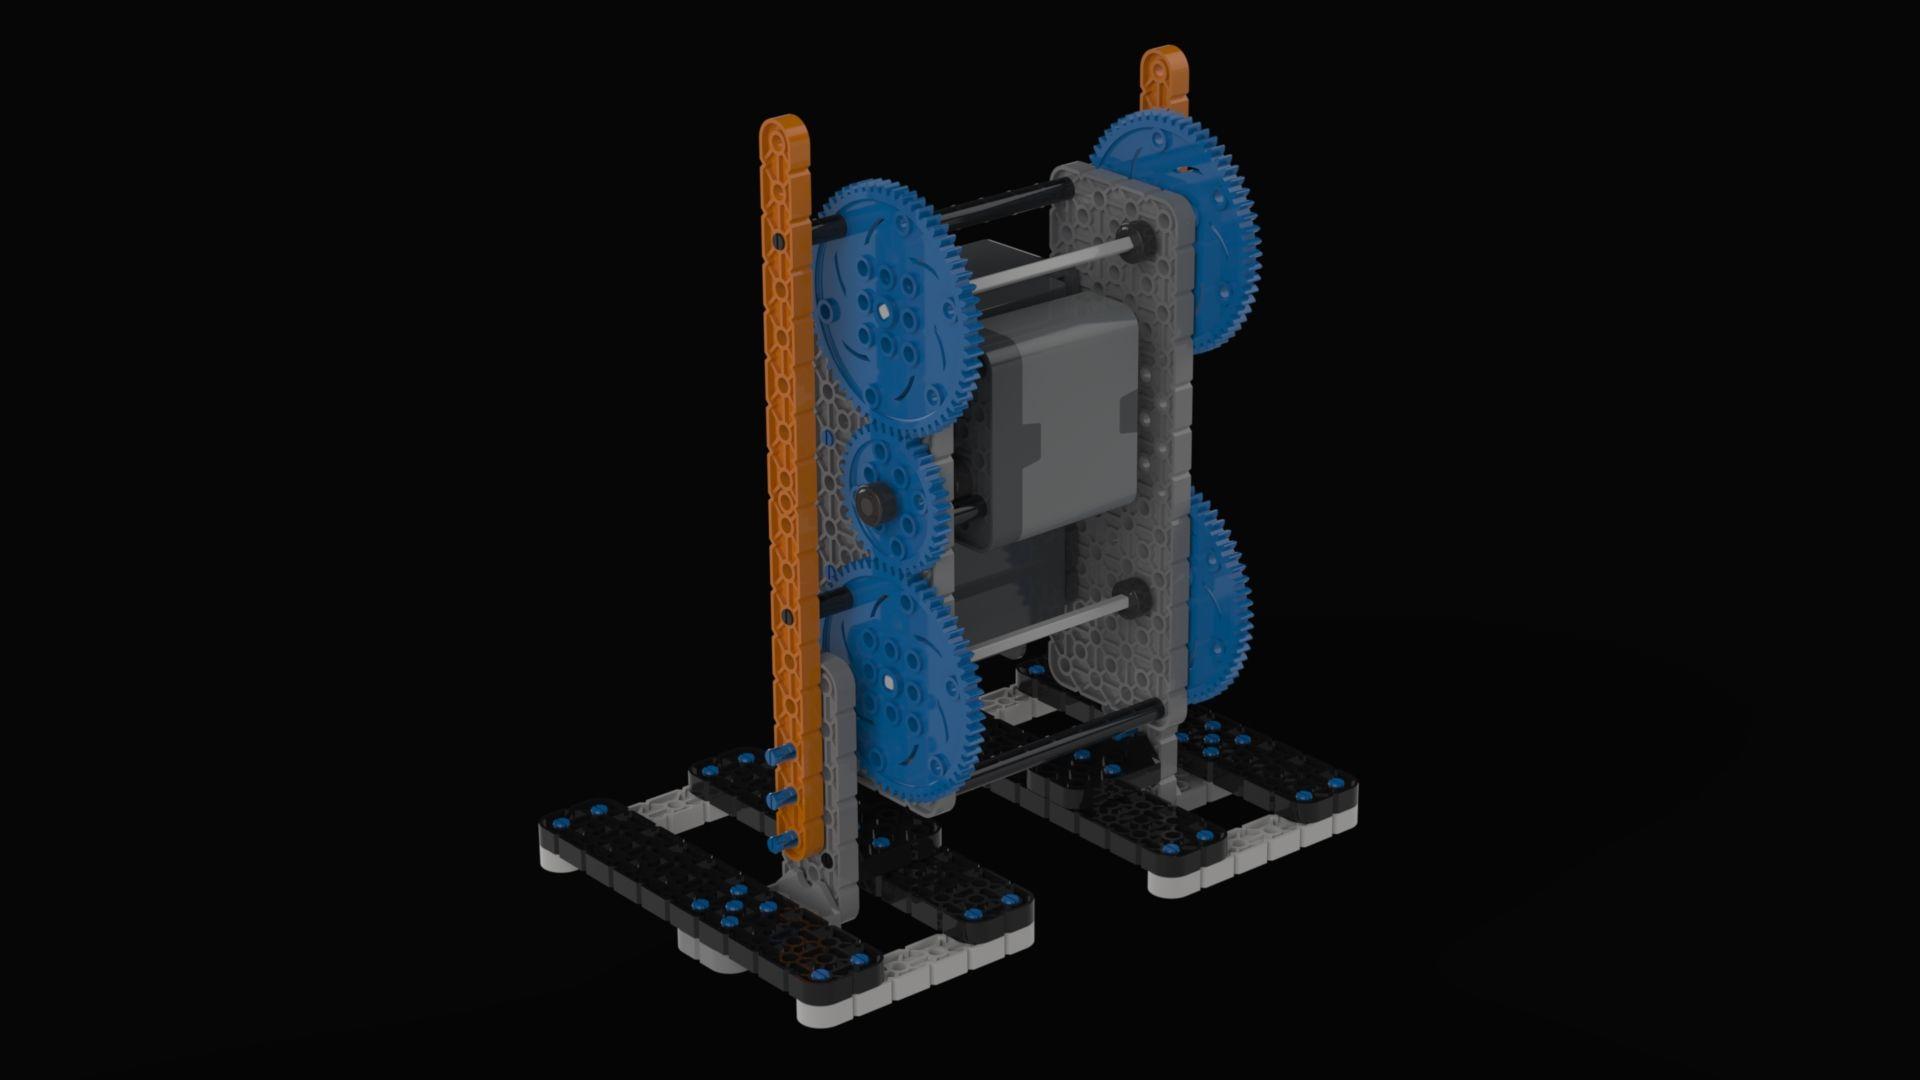 Configuration-no-configuration-3500-3500